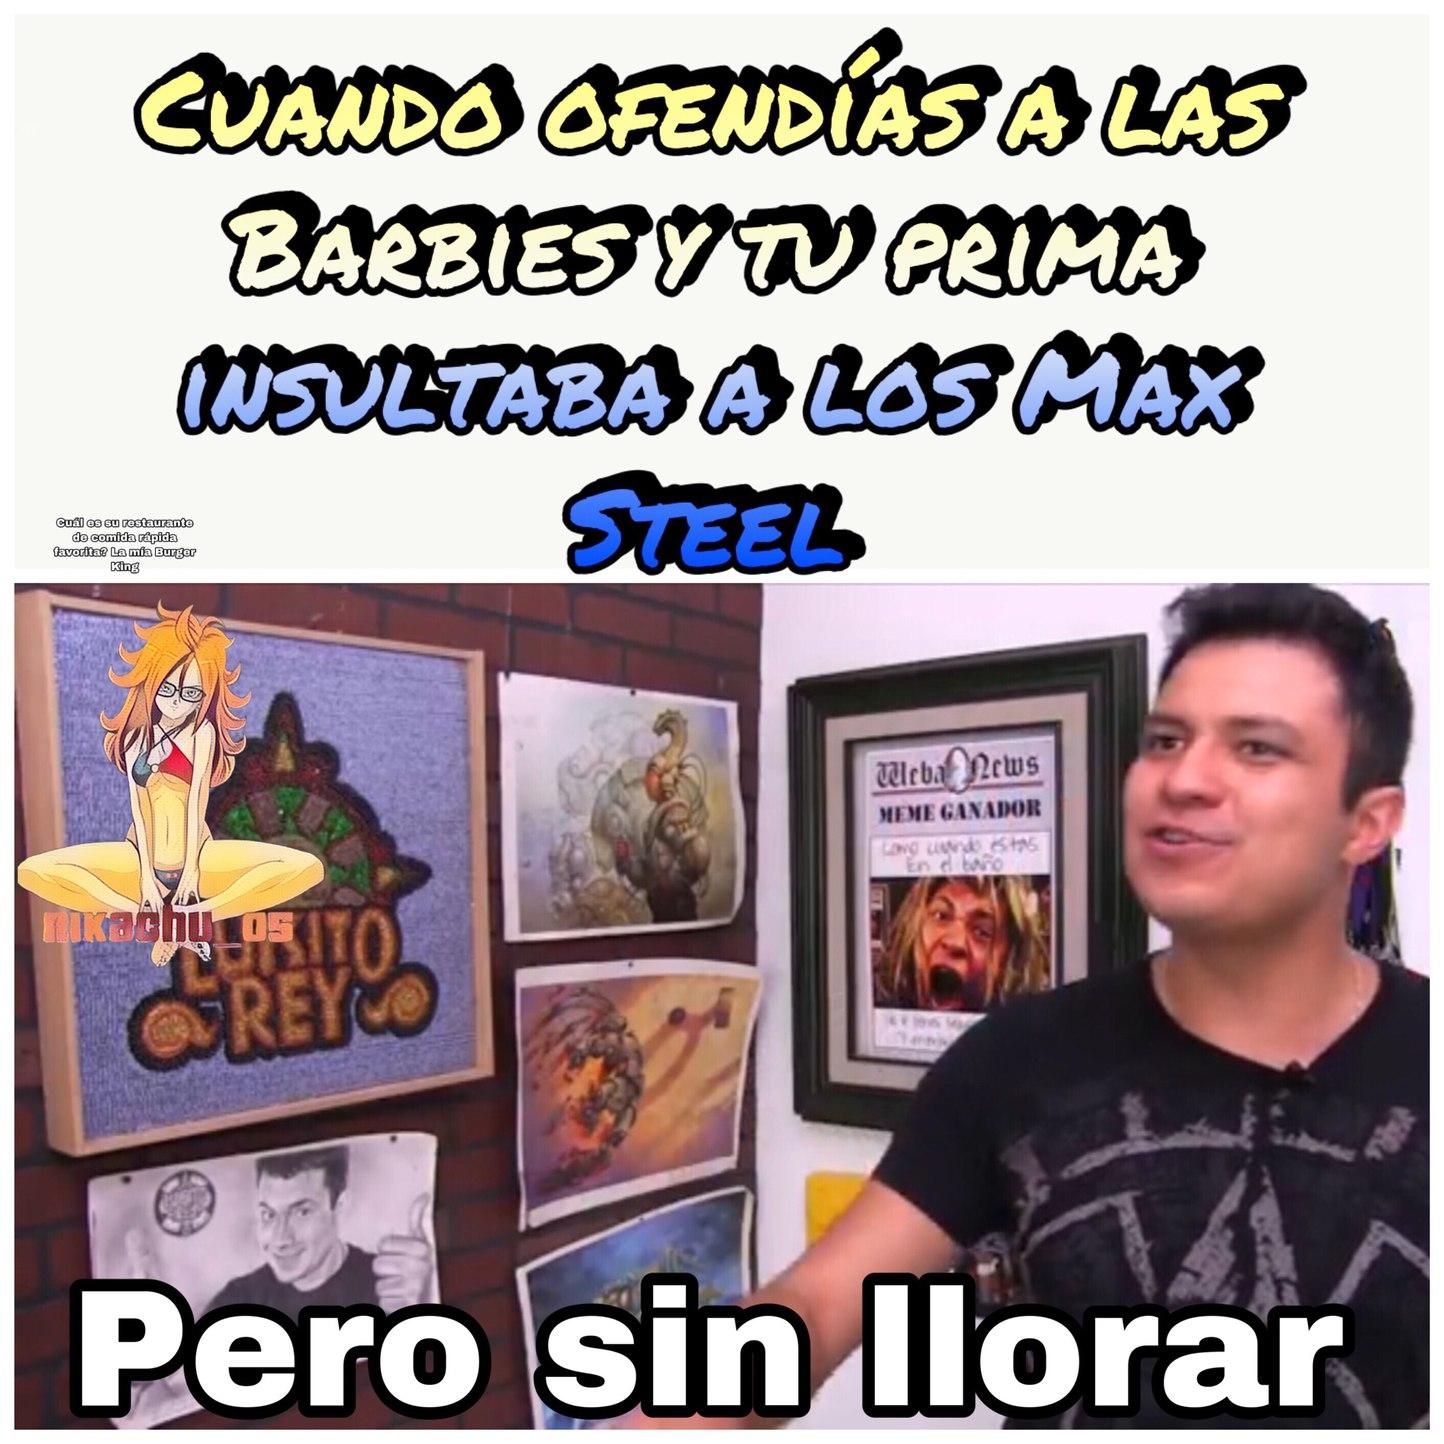 Oye, oye los max steel son lo máximo perra :betterthan: - meme